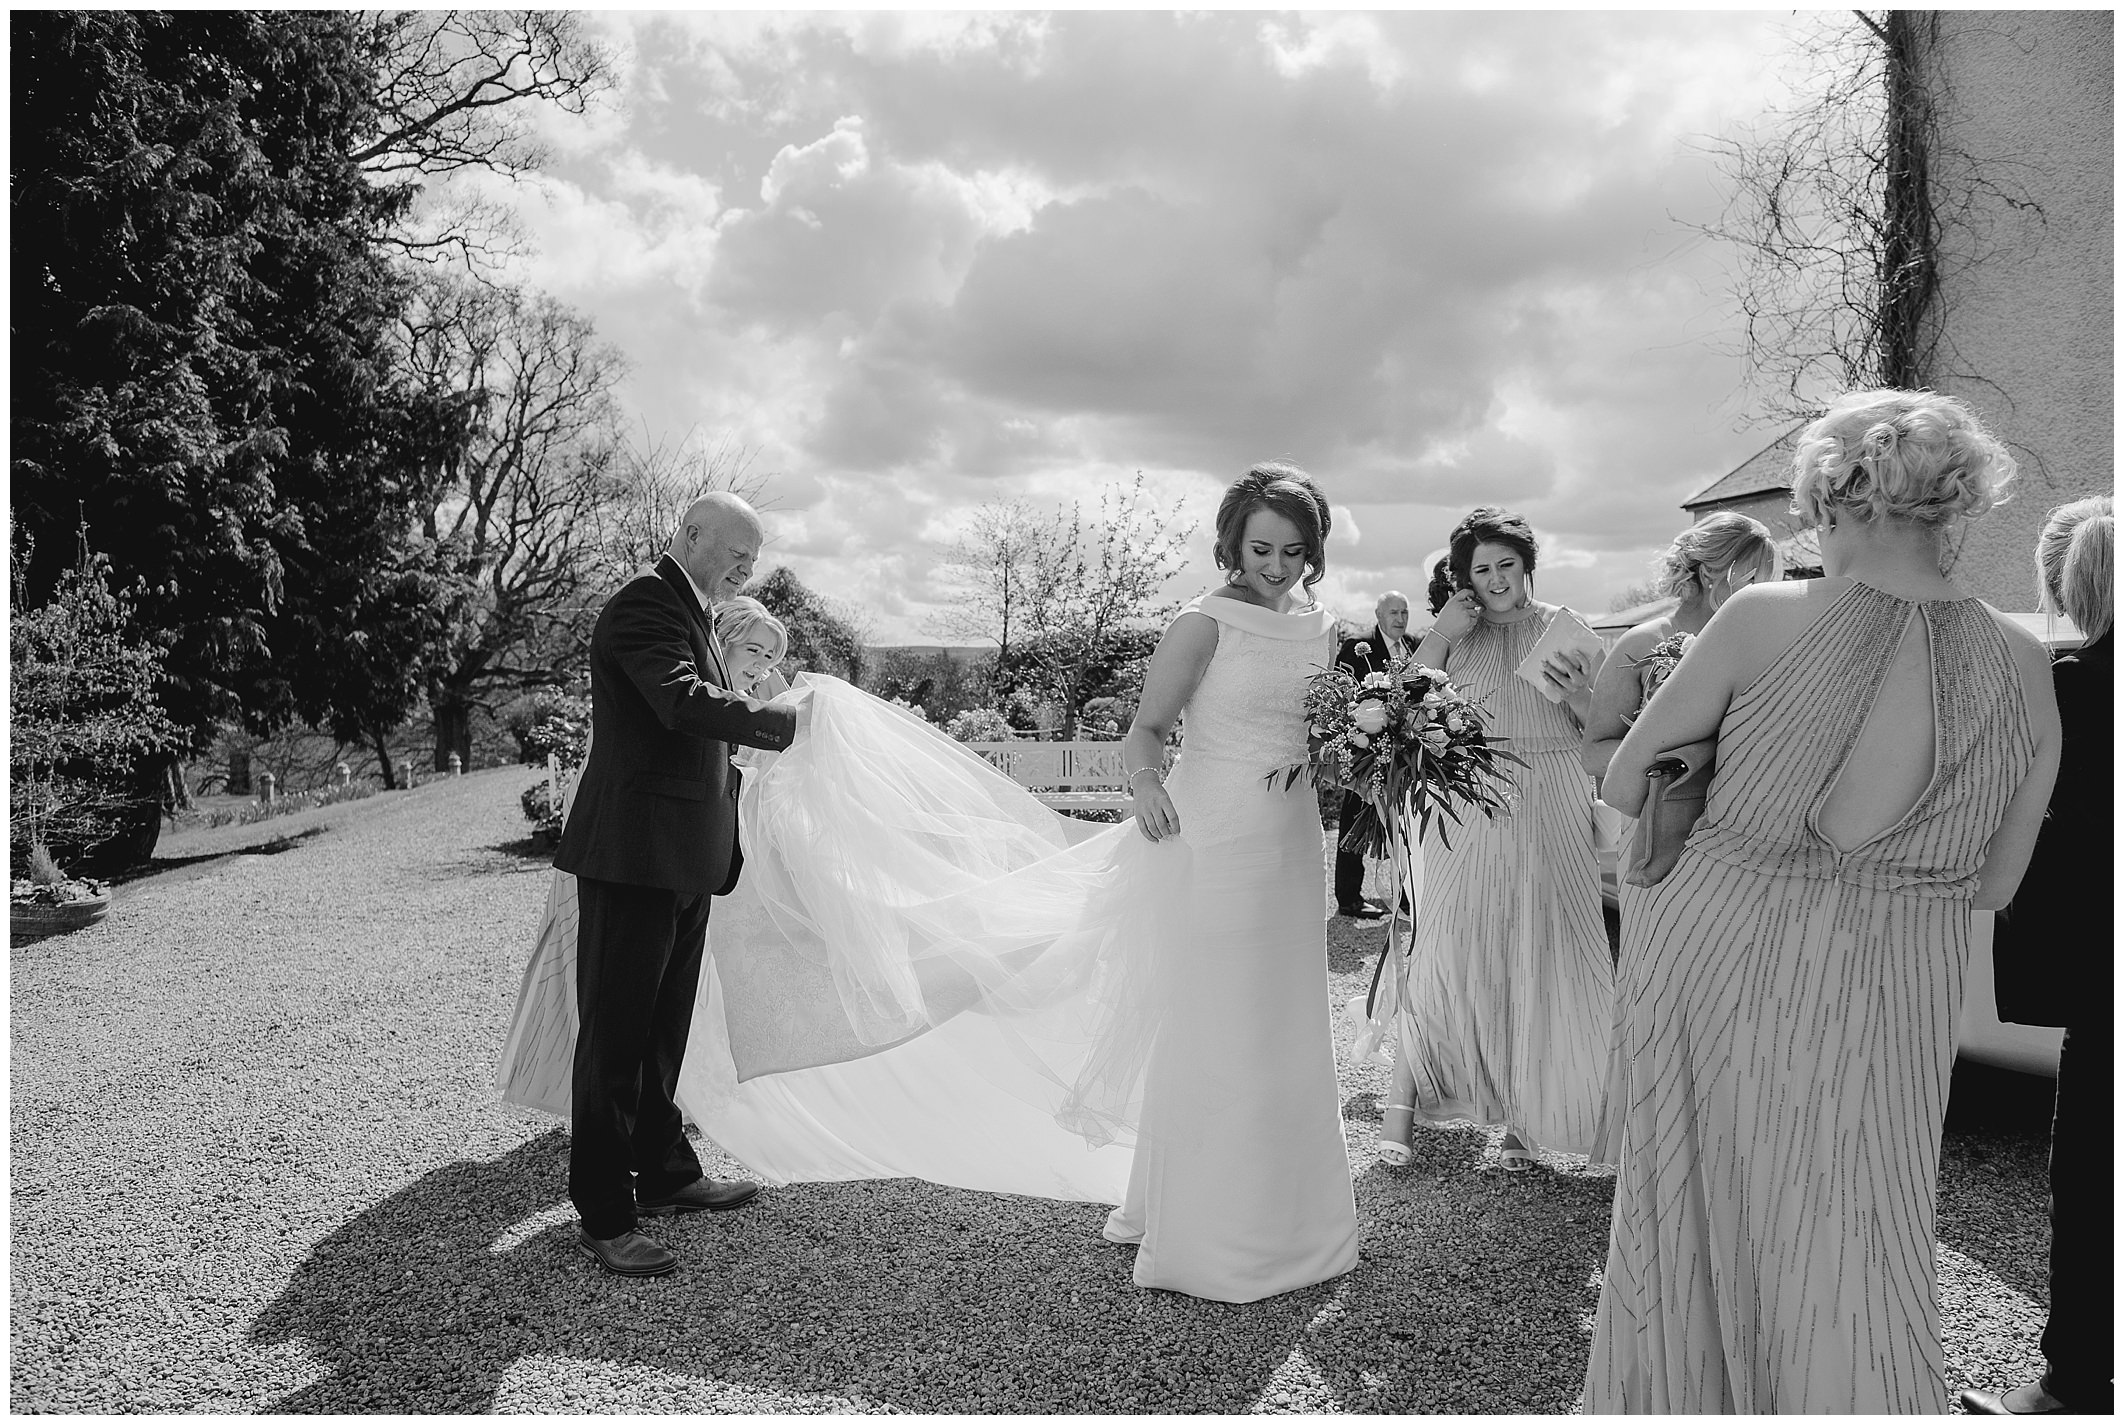 corick-house-wedding-hannah-gary-jude-browne-photography_0025.jpg